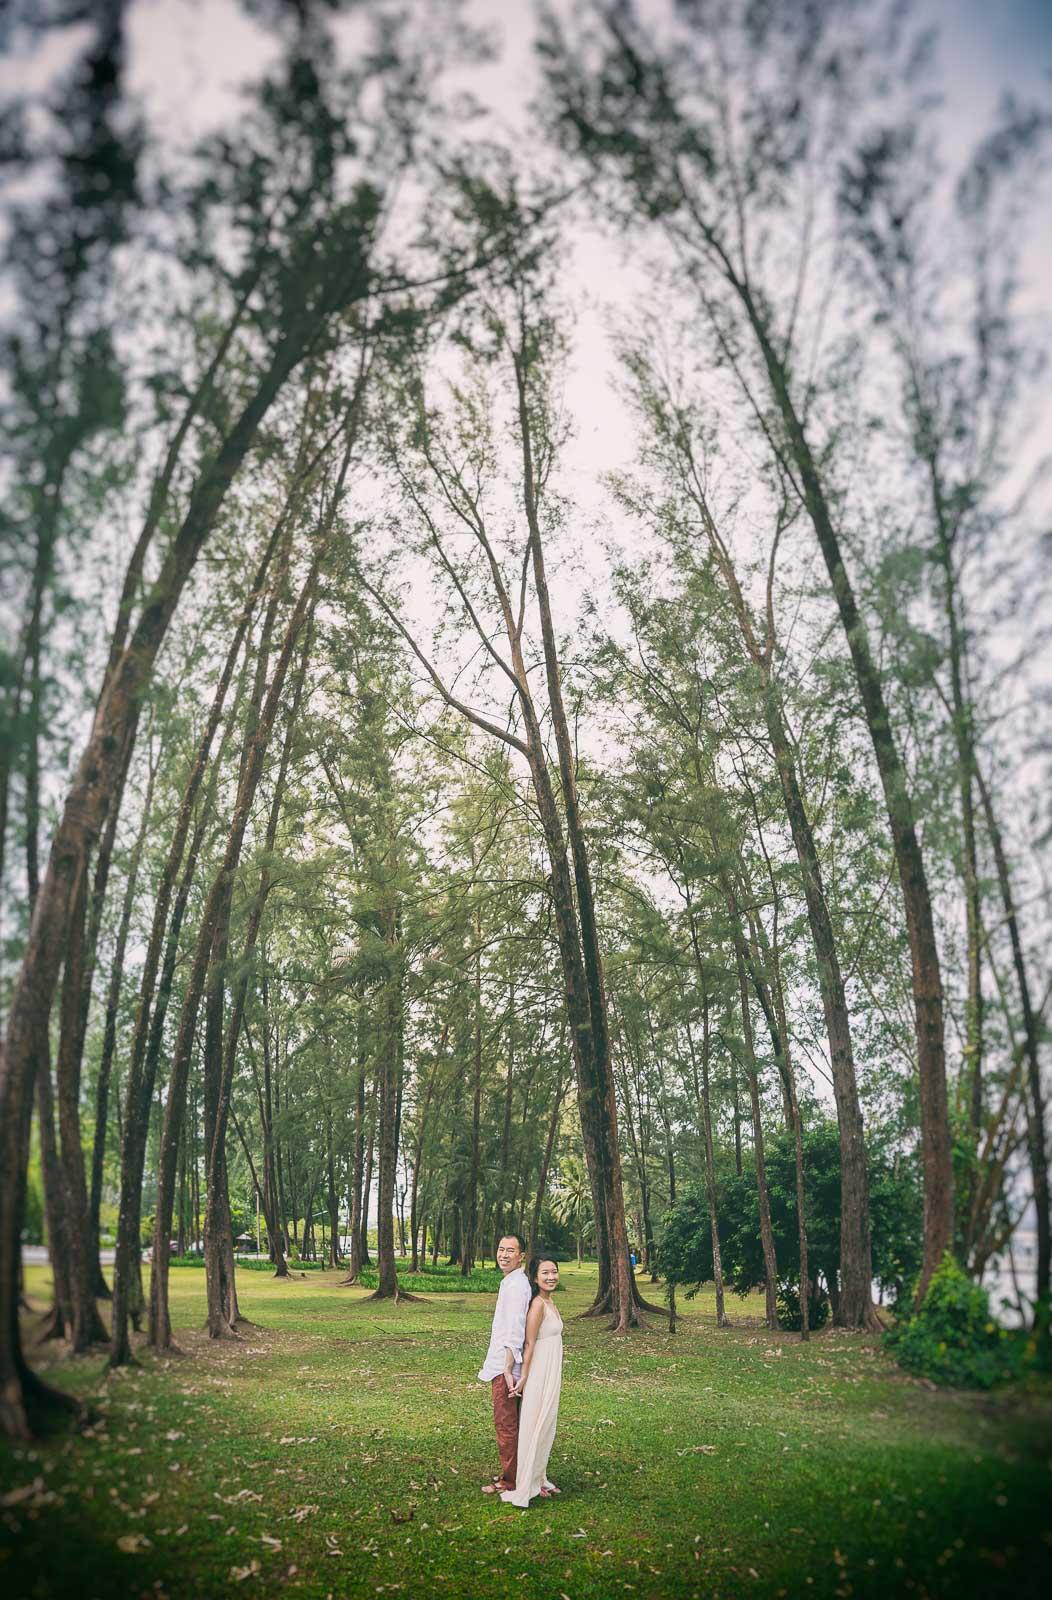 phuket-prewedding-photographer-thailand-wedding-photography-023